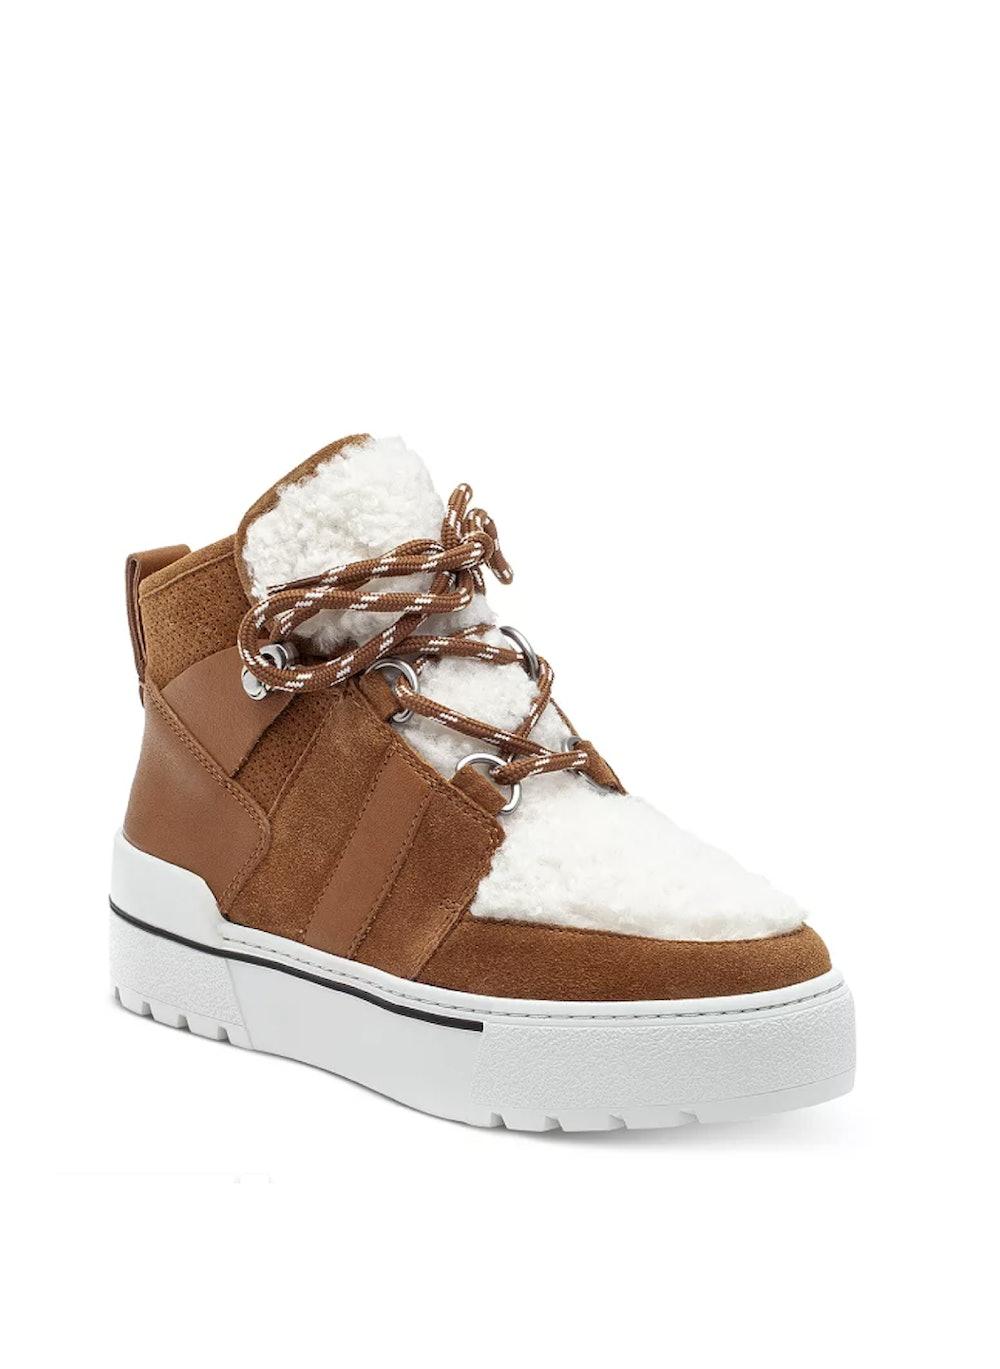 Nell Faux Shearling Sneaker Booties